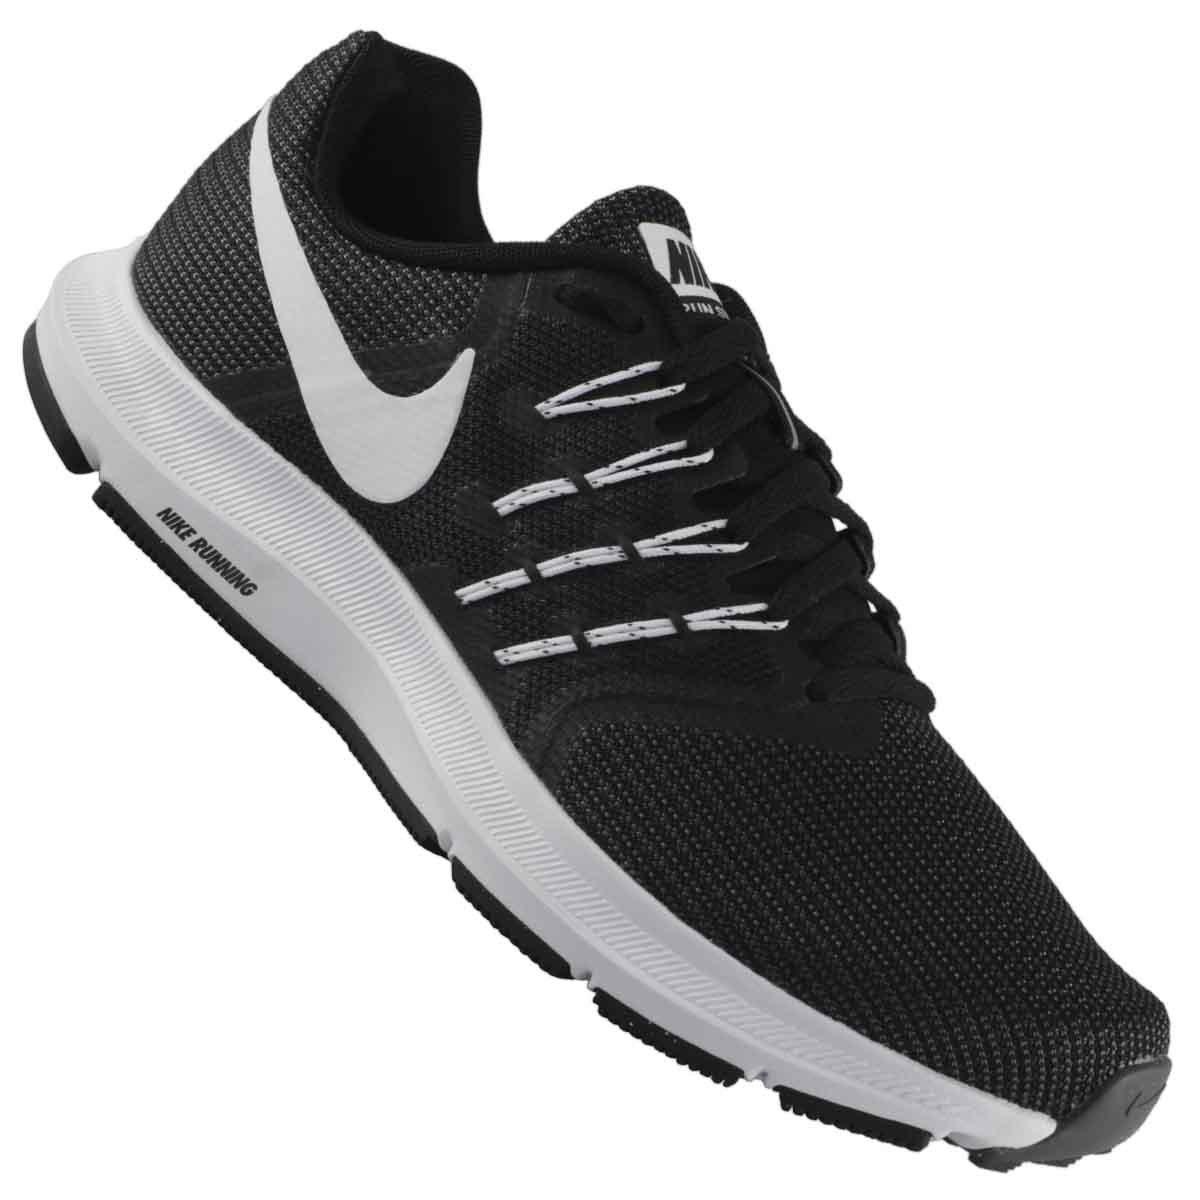 6d1bc1a8b25 Tênis Nike Run Swift Feminino